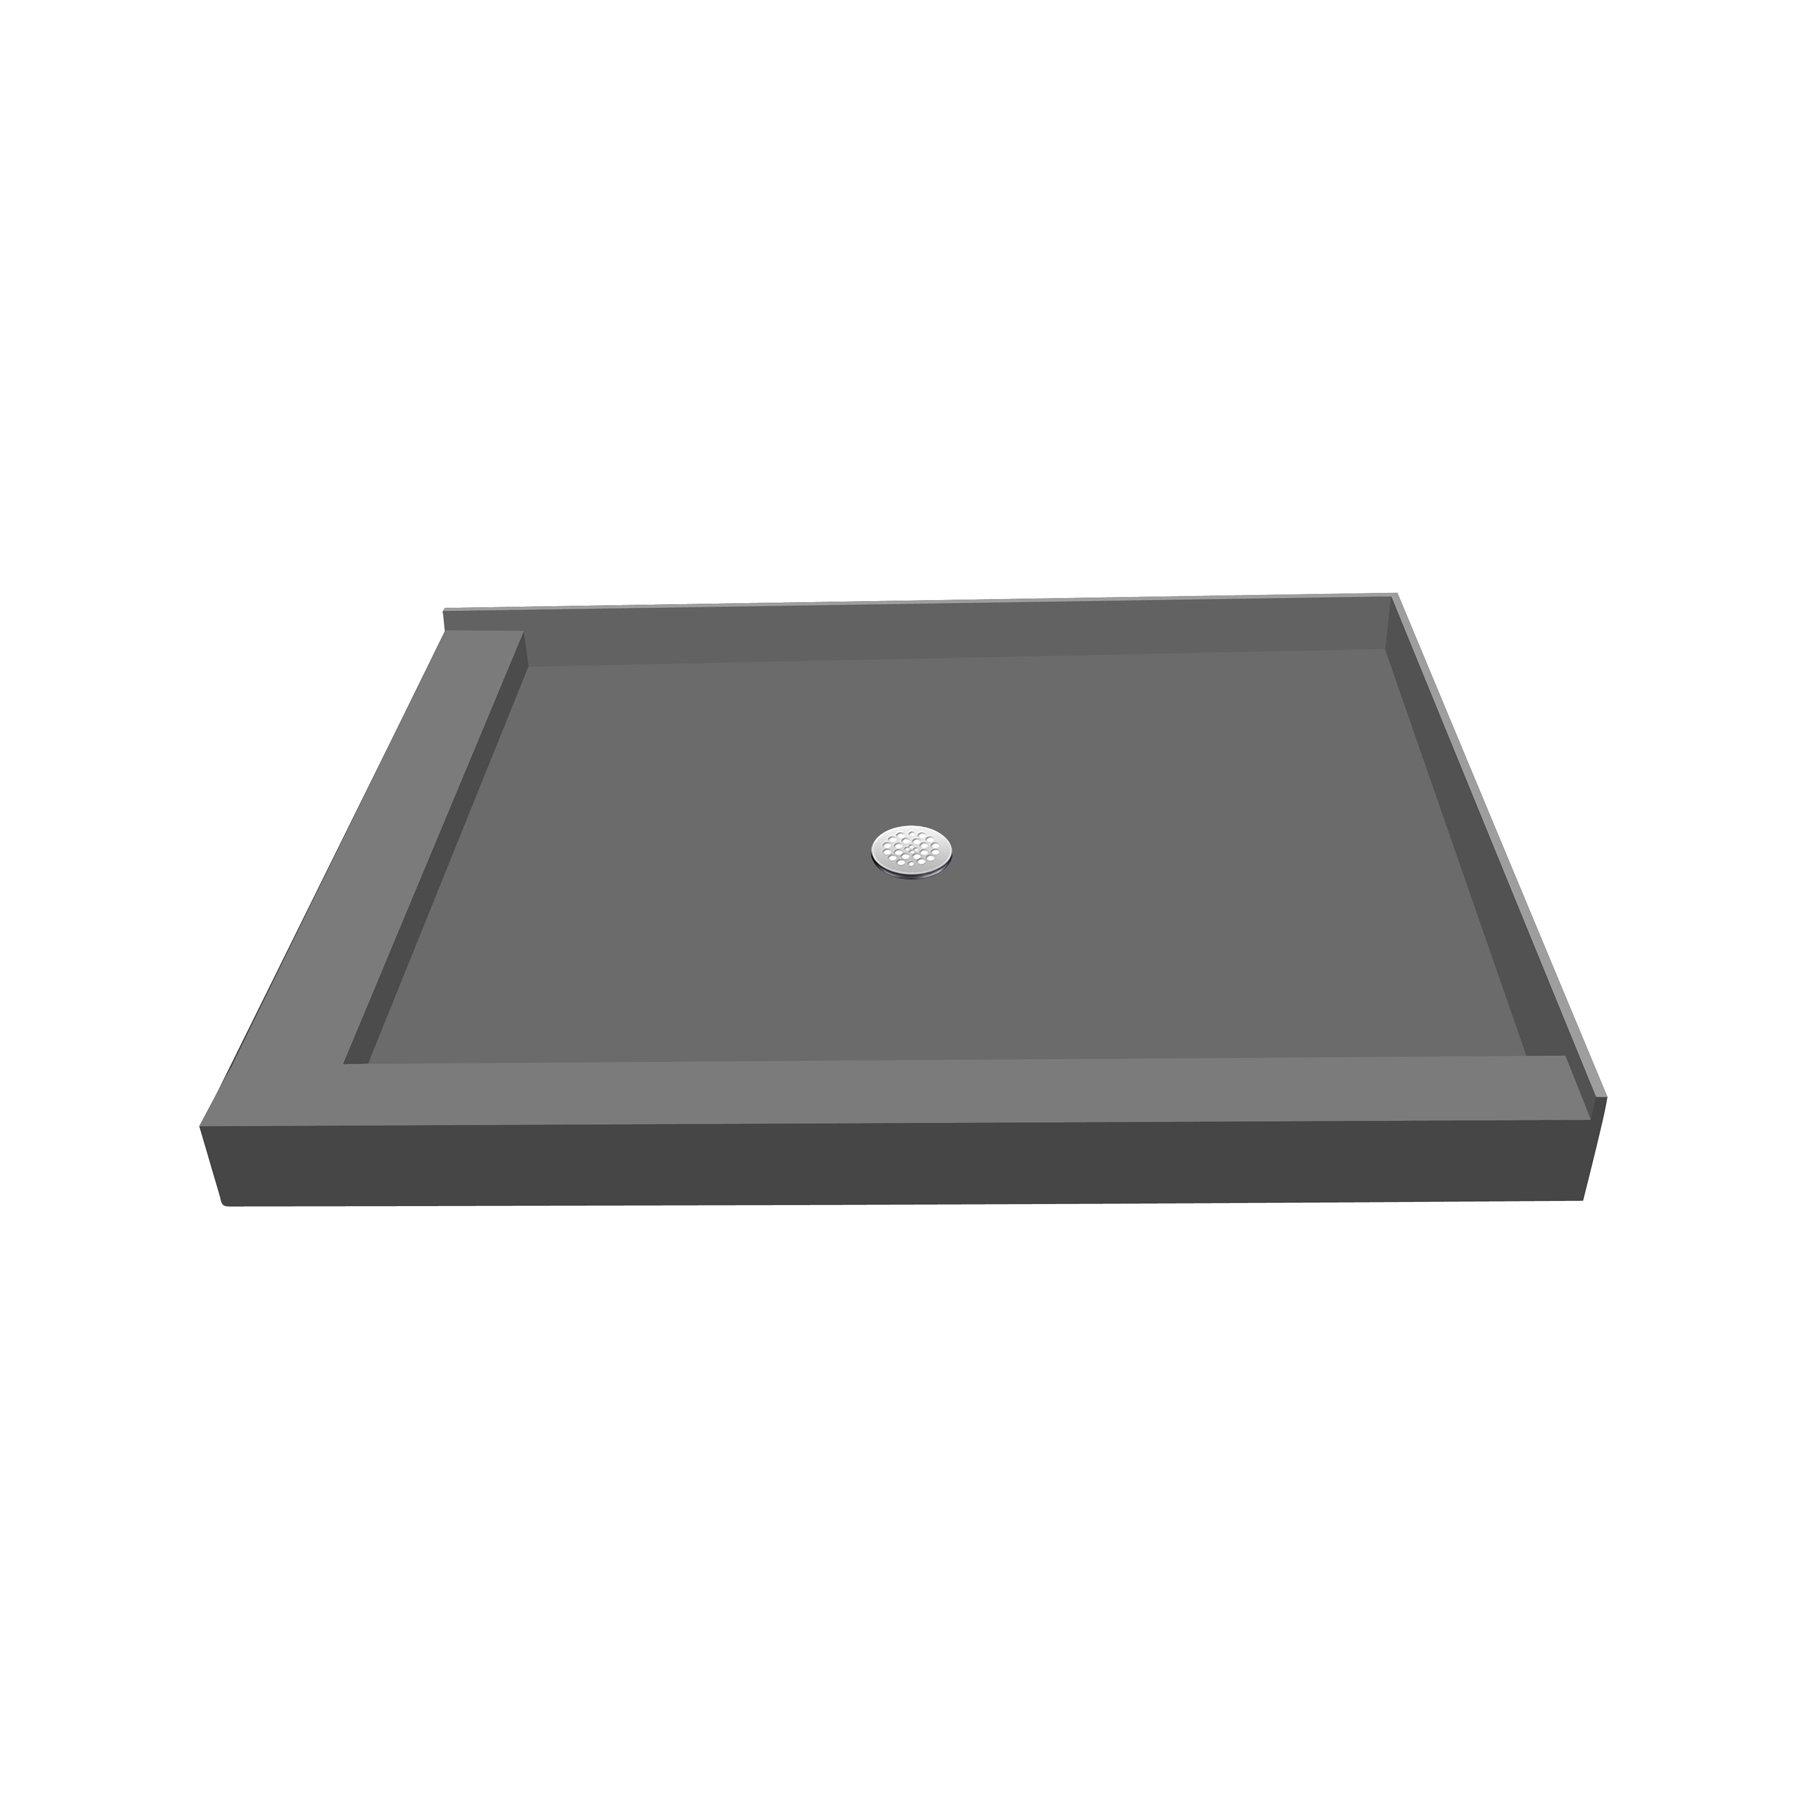 Tile Redi USA P3648CDL-PVC Redi Base Shower Pan with Center Drain & Left Dual Curb, 36'' D x 48'' W